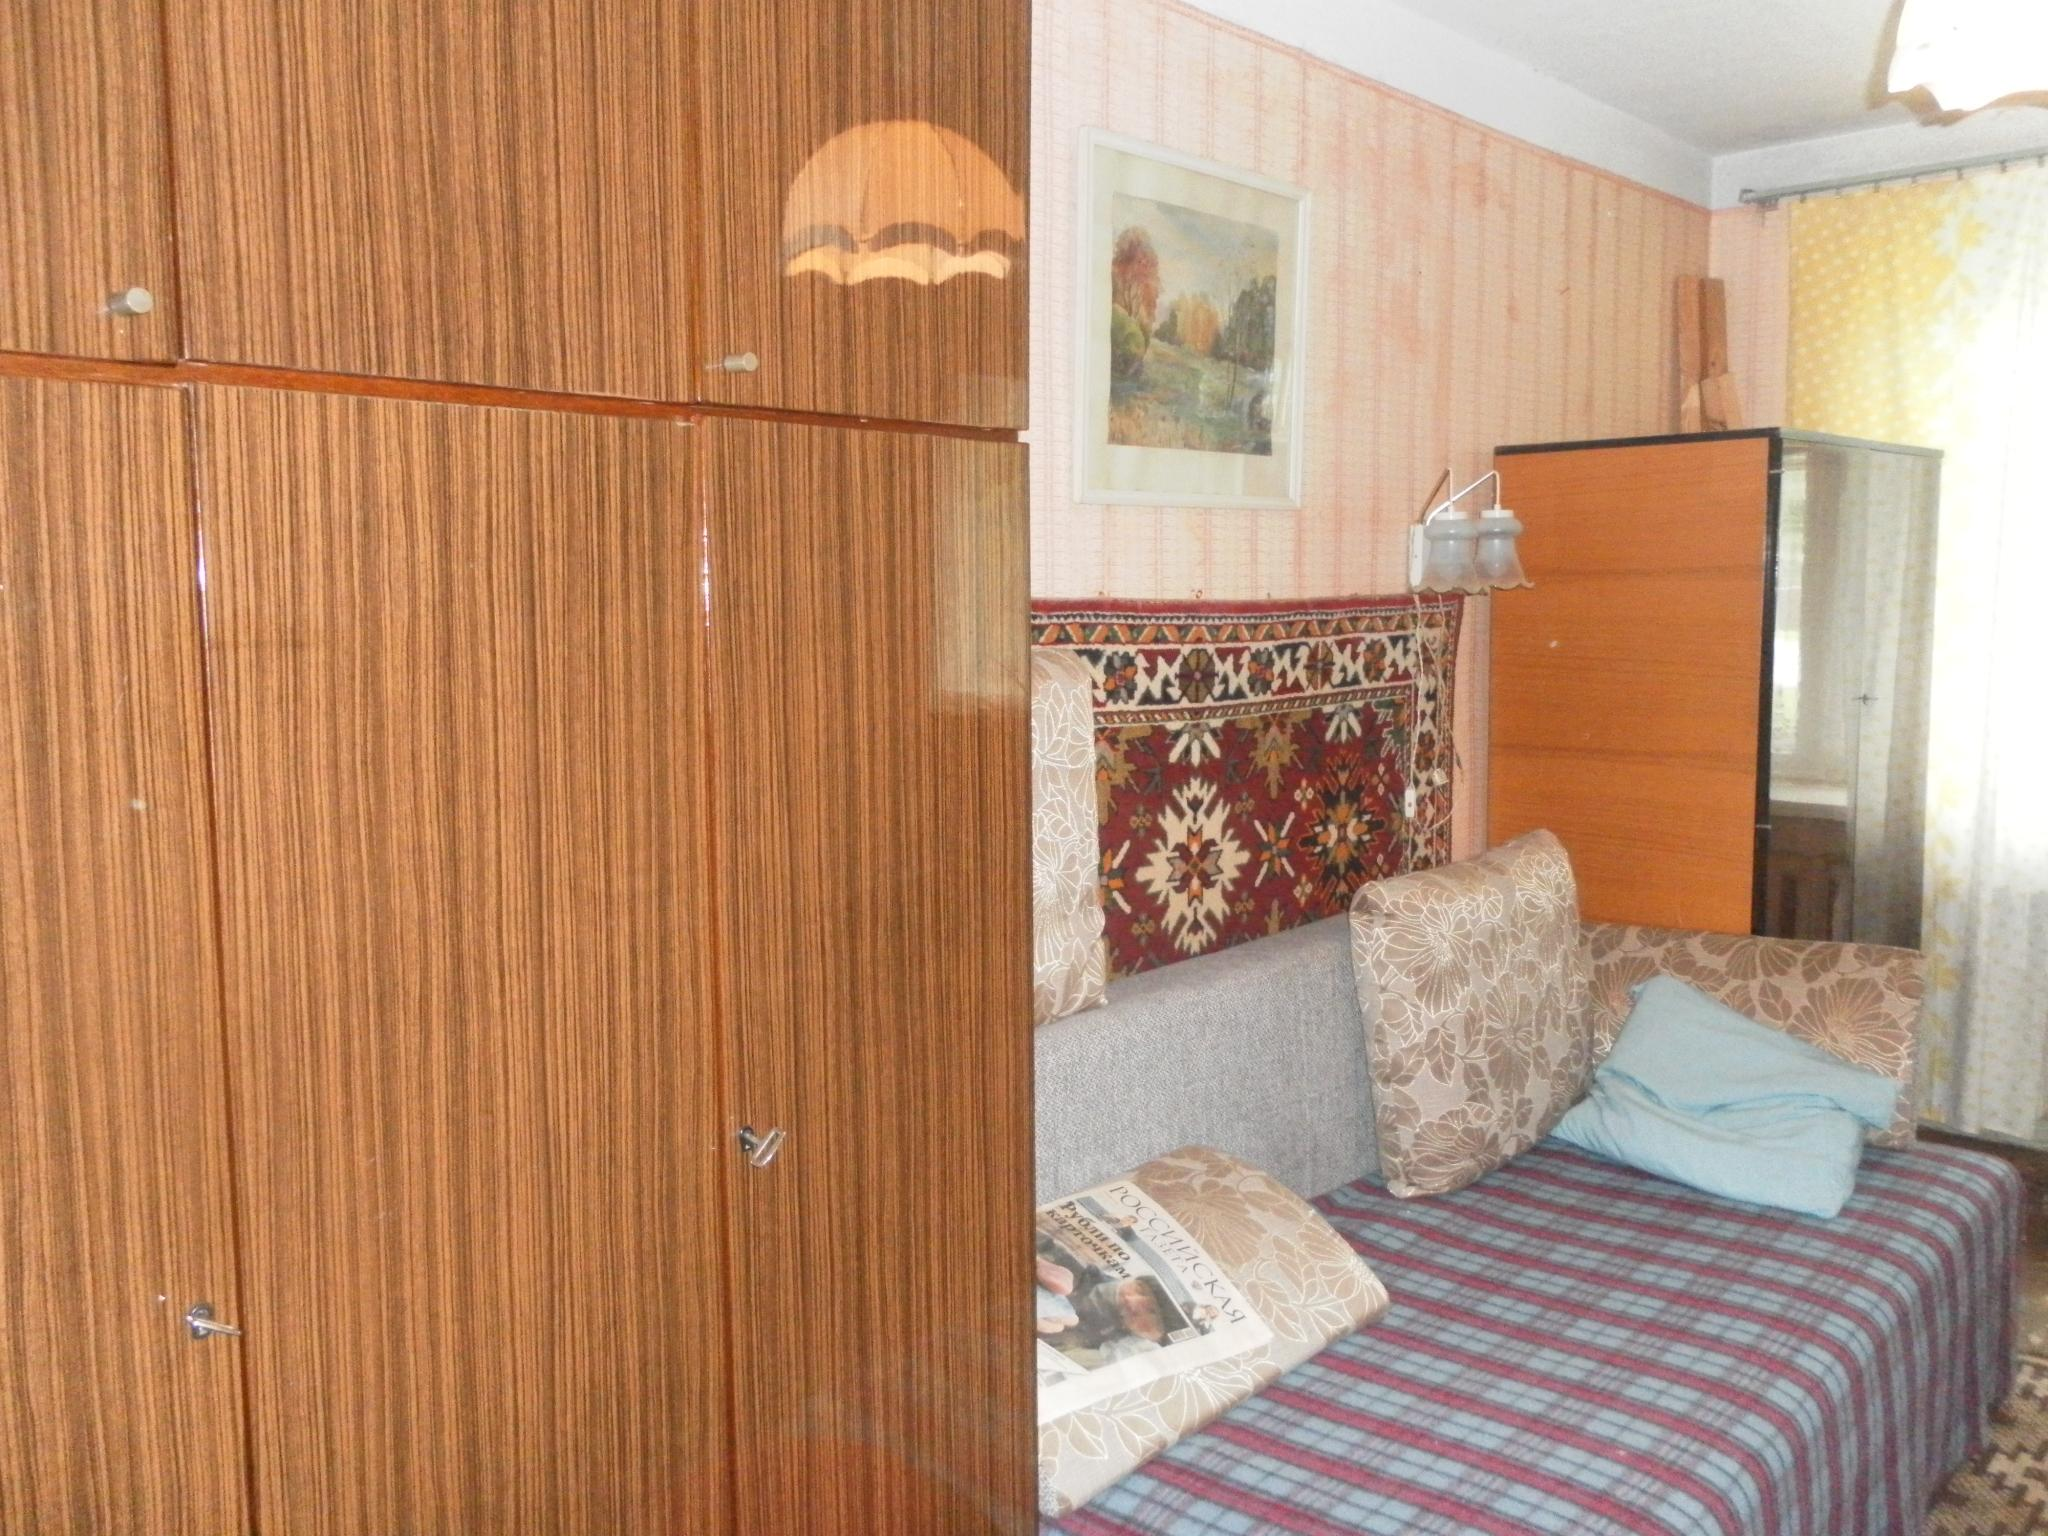 Двухкомнатная квартира - Н.Васильева, д. 75